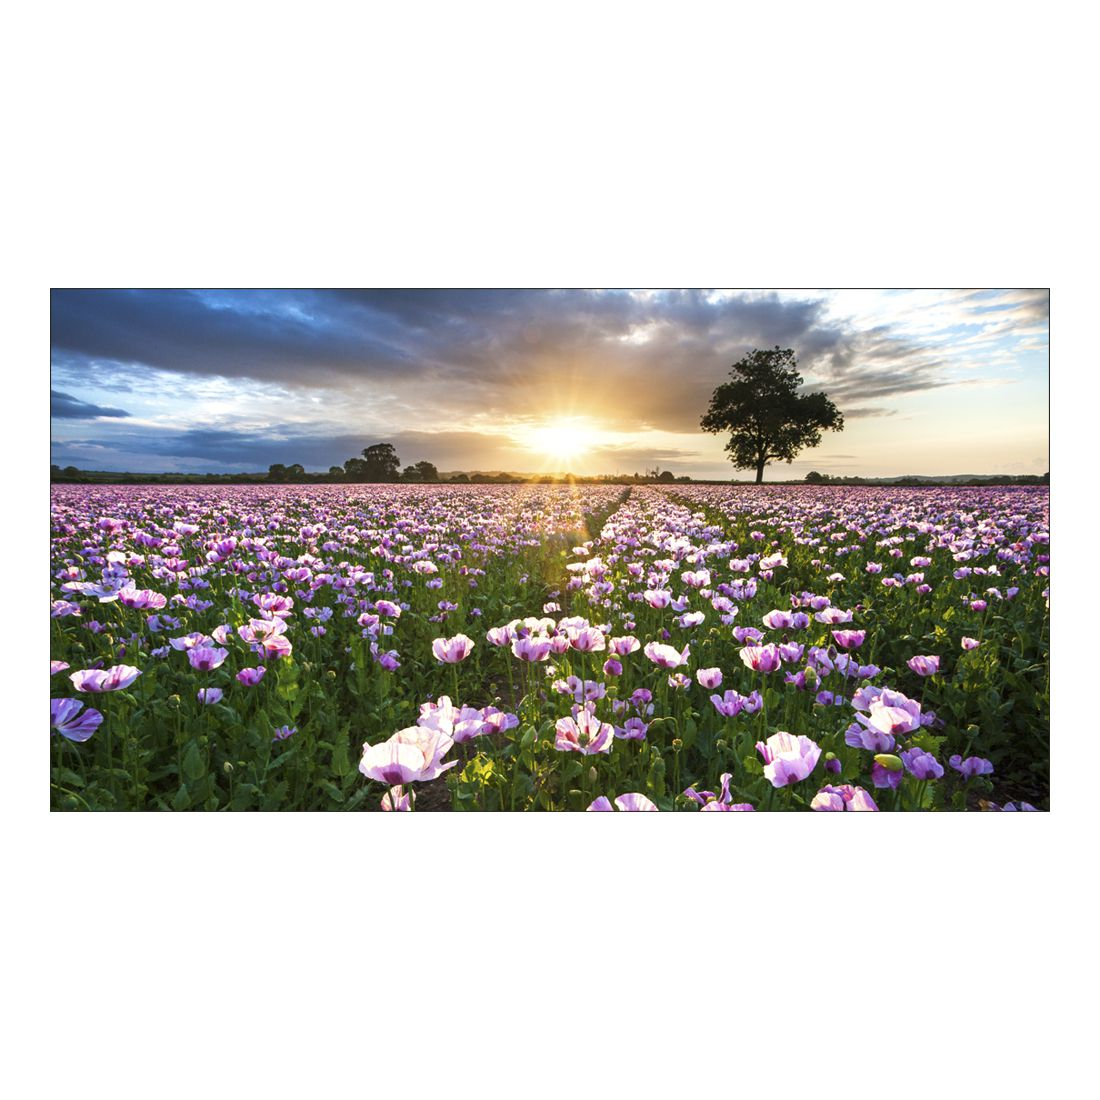 Leinwandbild SUNSET OVER FLOWERBED – Abmessung 100 x 75 cm, Gallery of Innovative Art günstig online kaufen